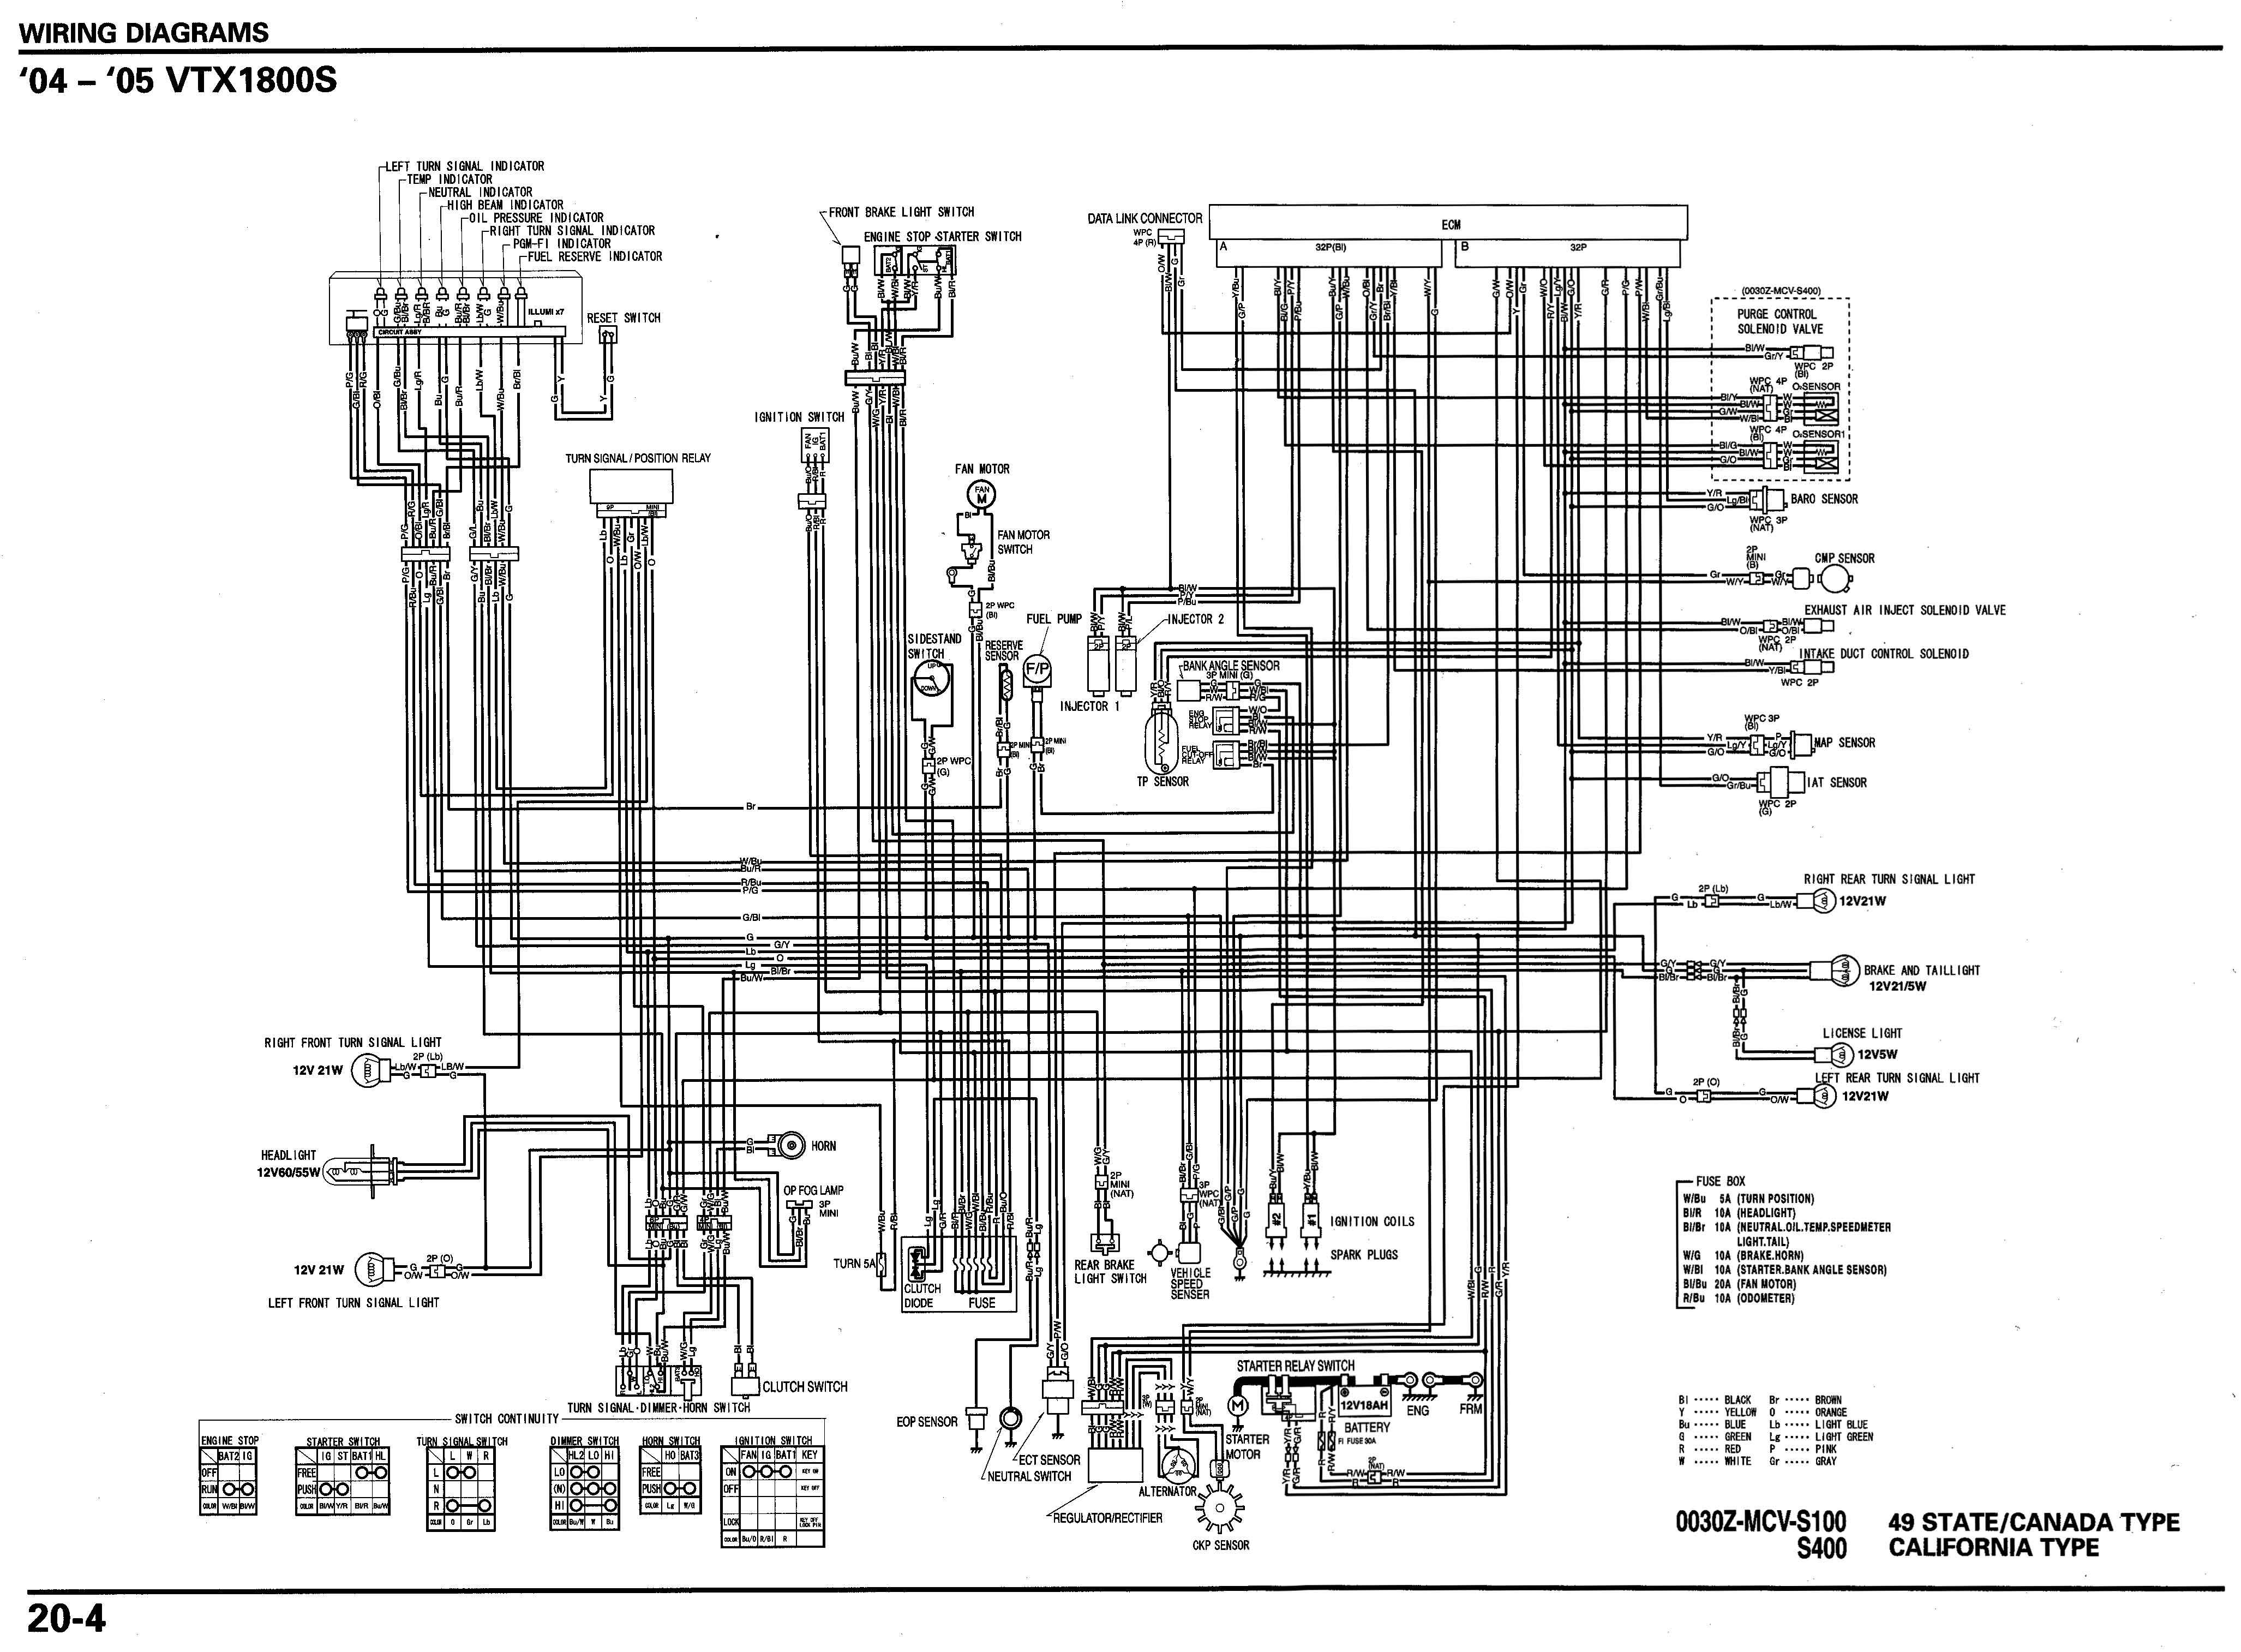 honda goldwing 1800 radio wiring diagram typical light switch s 2004 speedo in 2002 1800s vtxoa